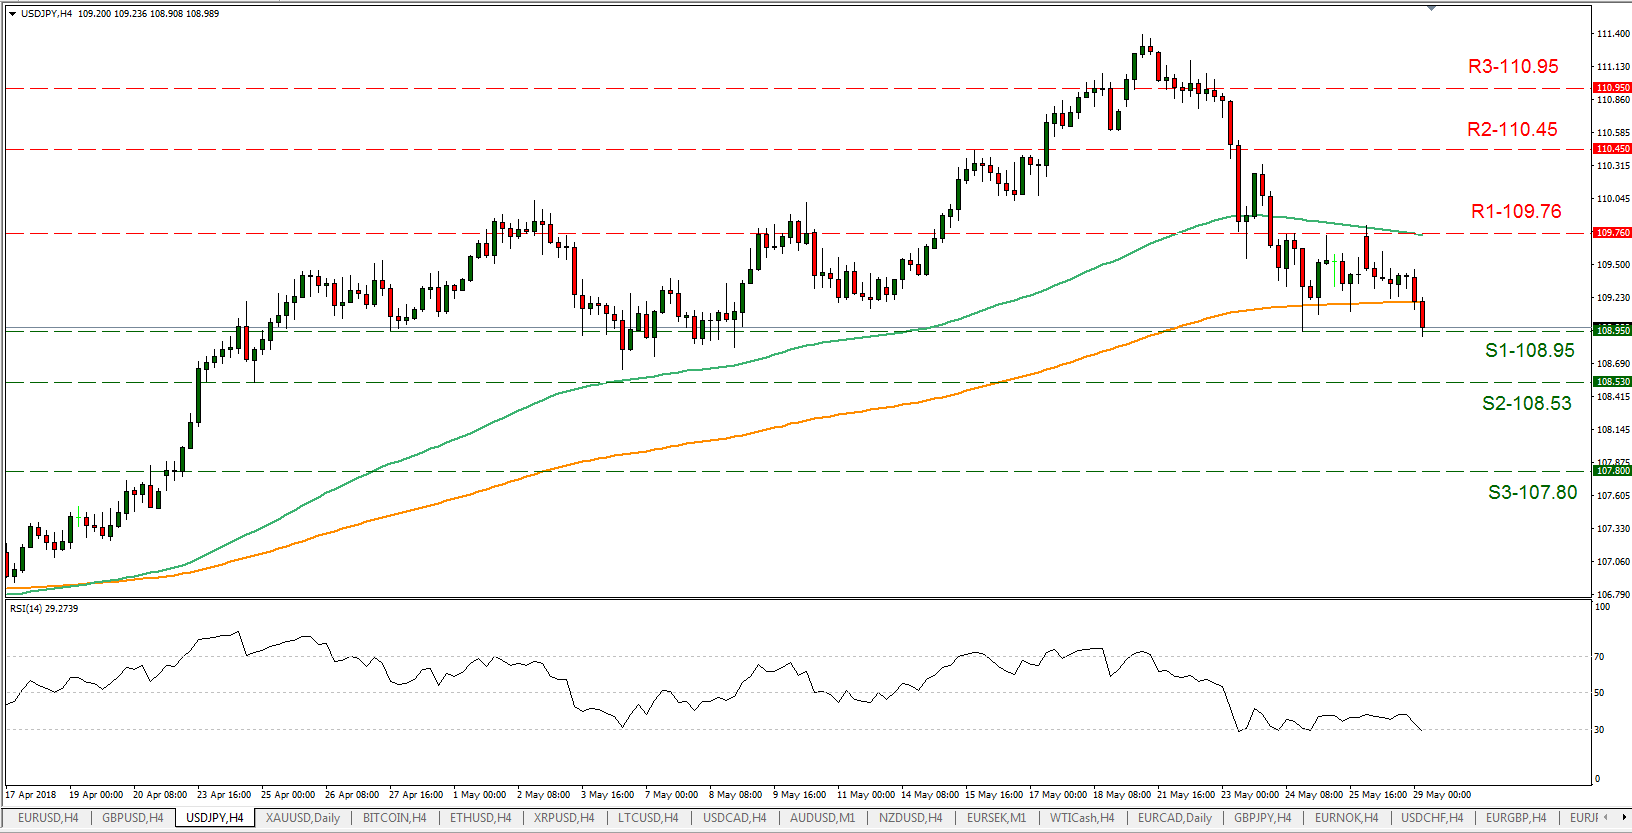 USD/JPY 29/05/2018 | EconAlerts